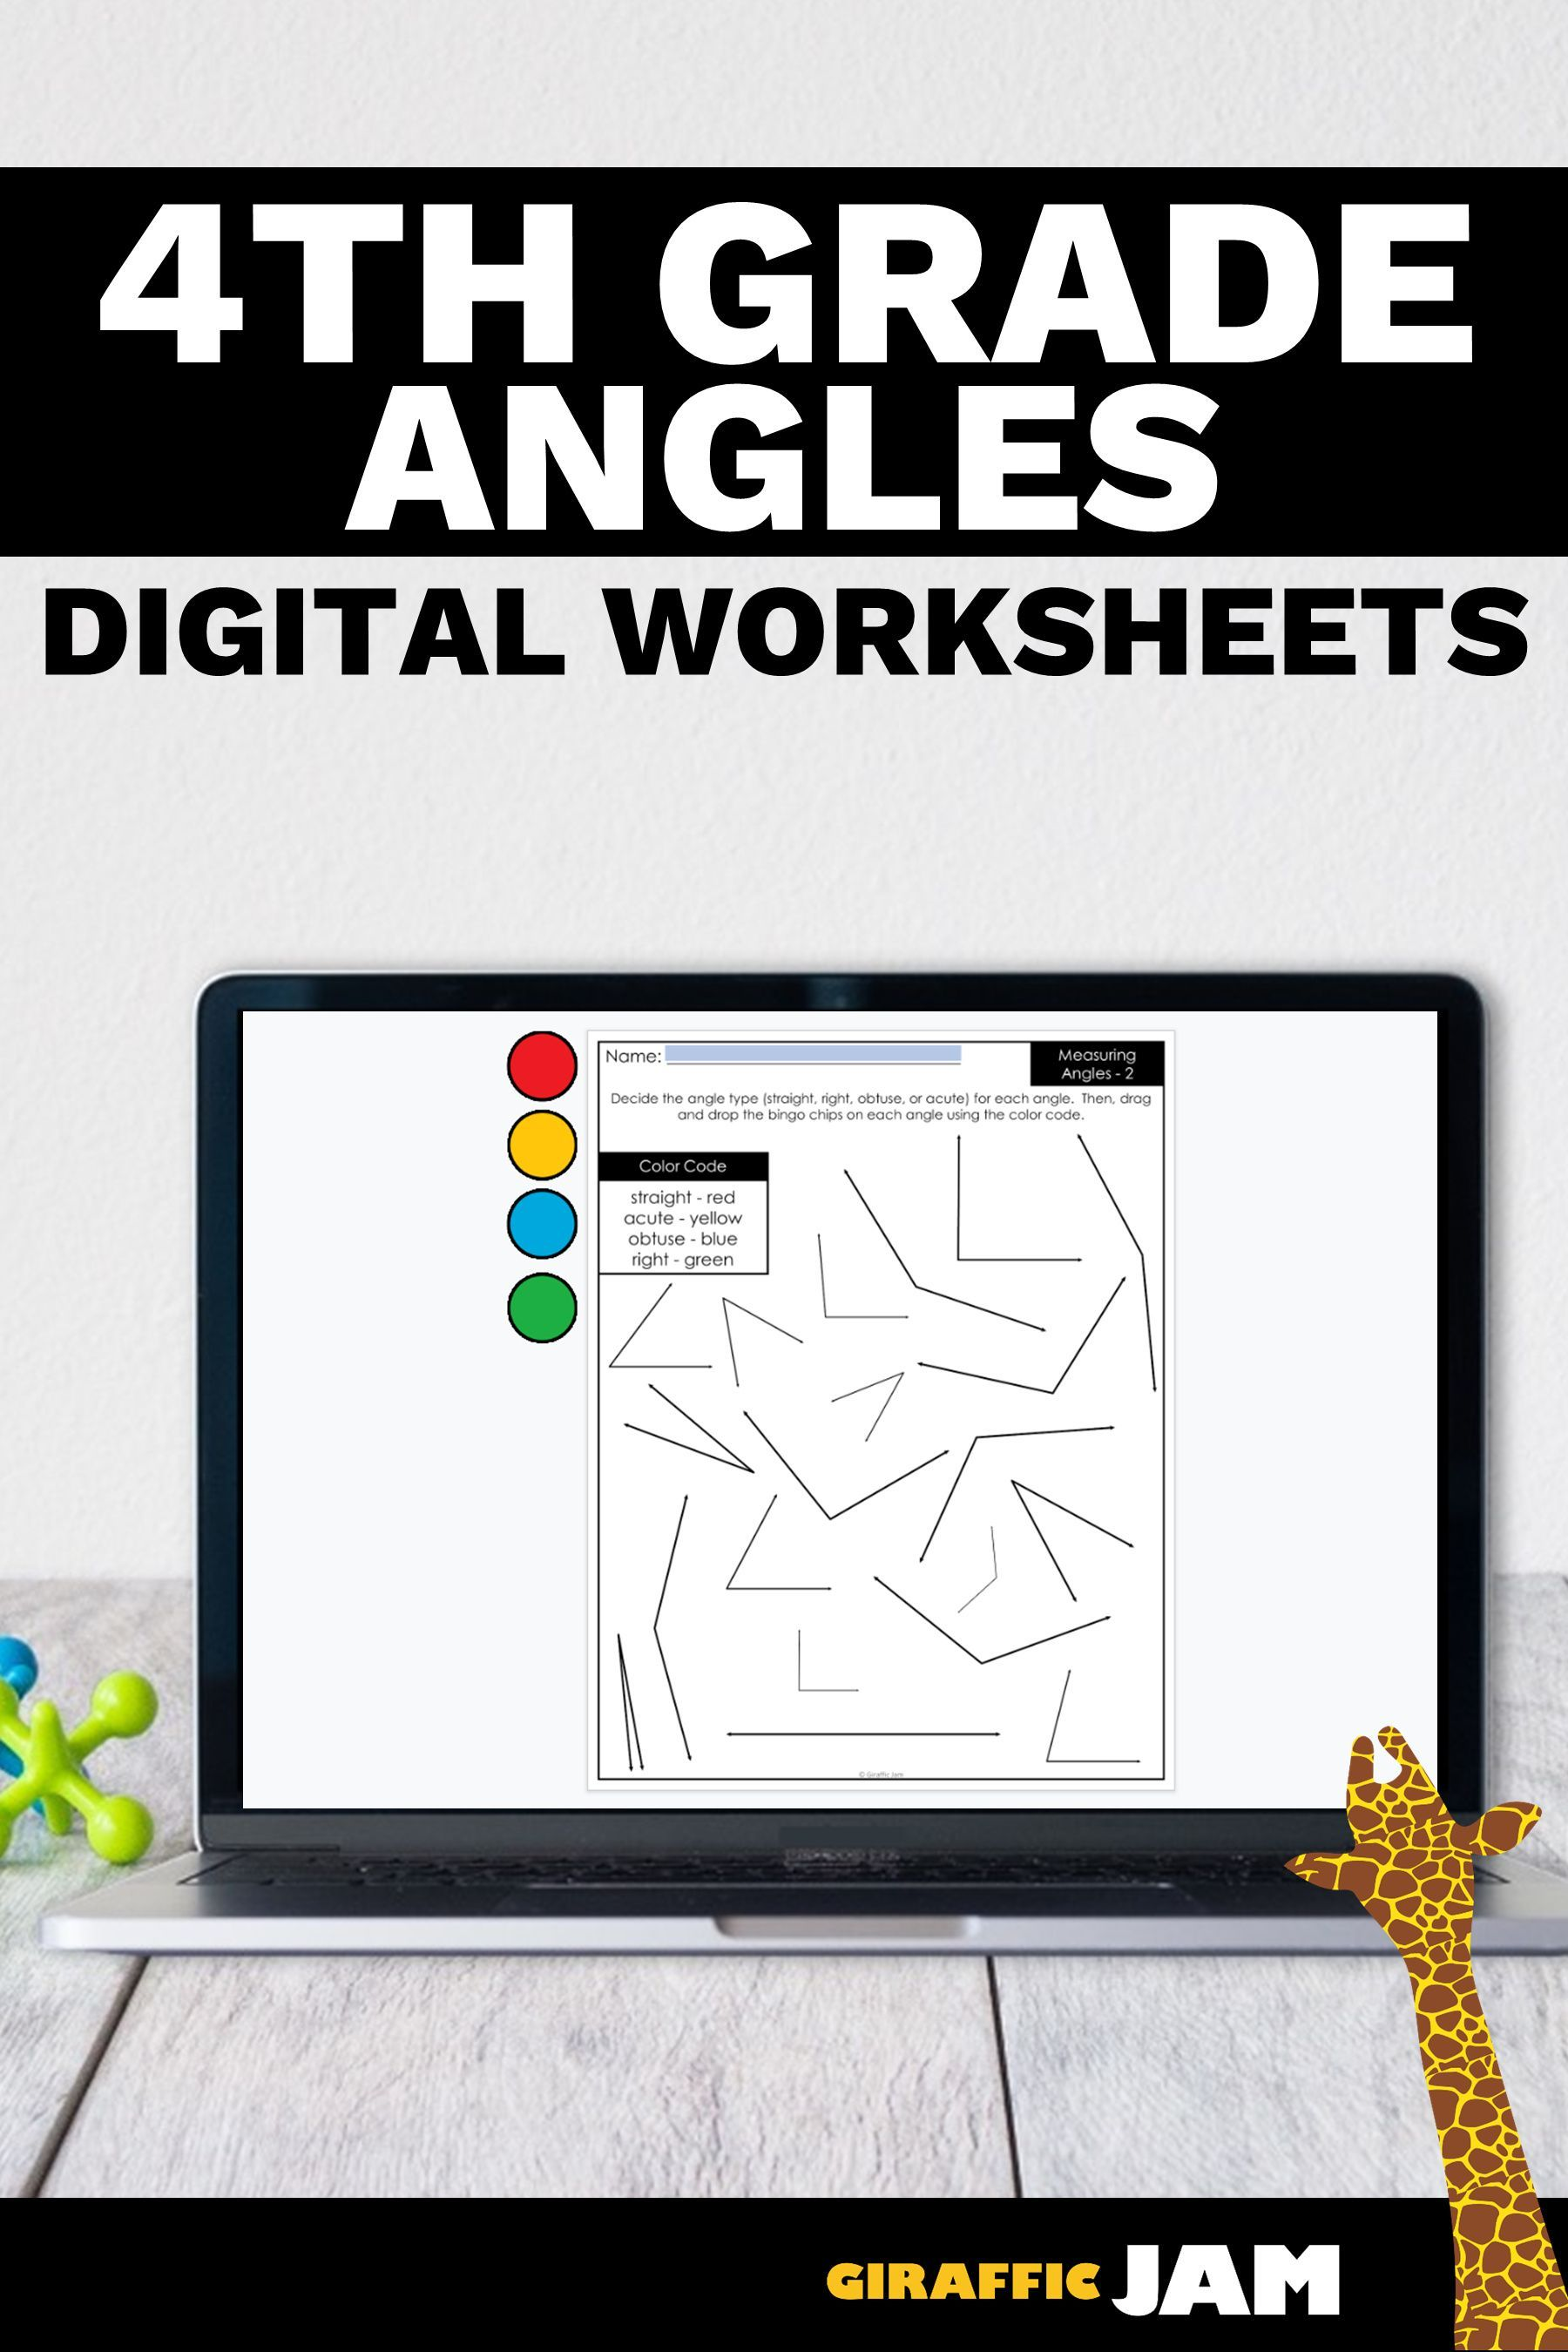 4th Grade Measurement Measurement Worksheets Angles Measuring Angles Digital Worksheets D Google Classroom Measurement Activities Distance Learning [ 2700 x 1800 Pixel ]